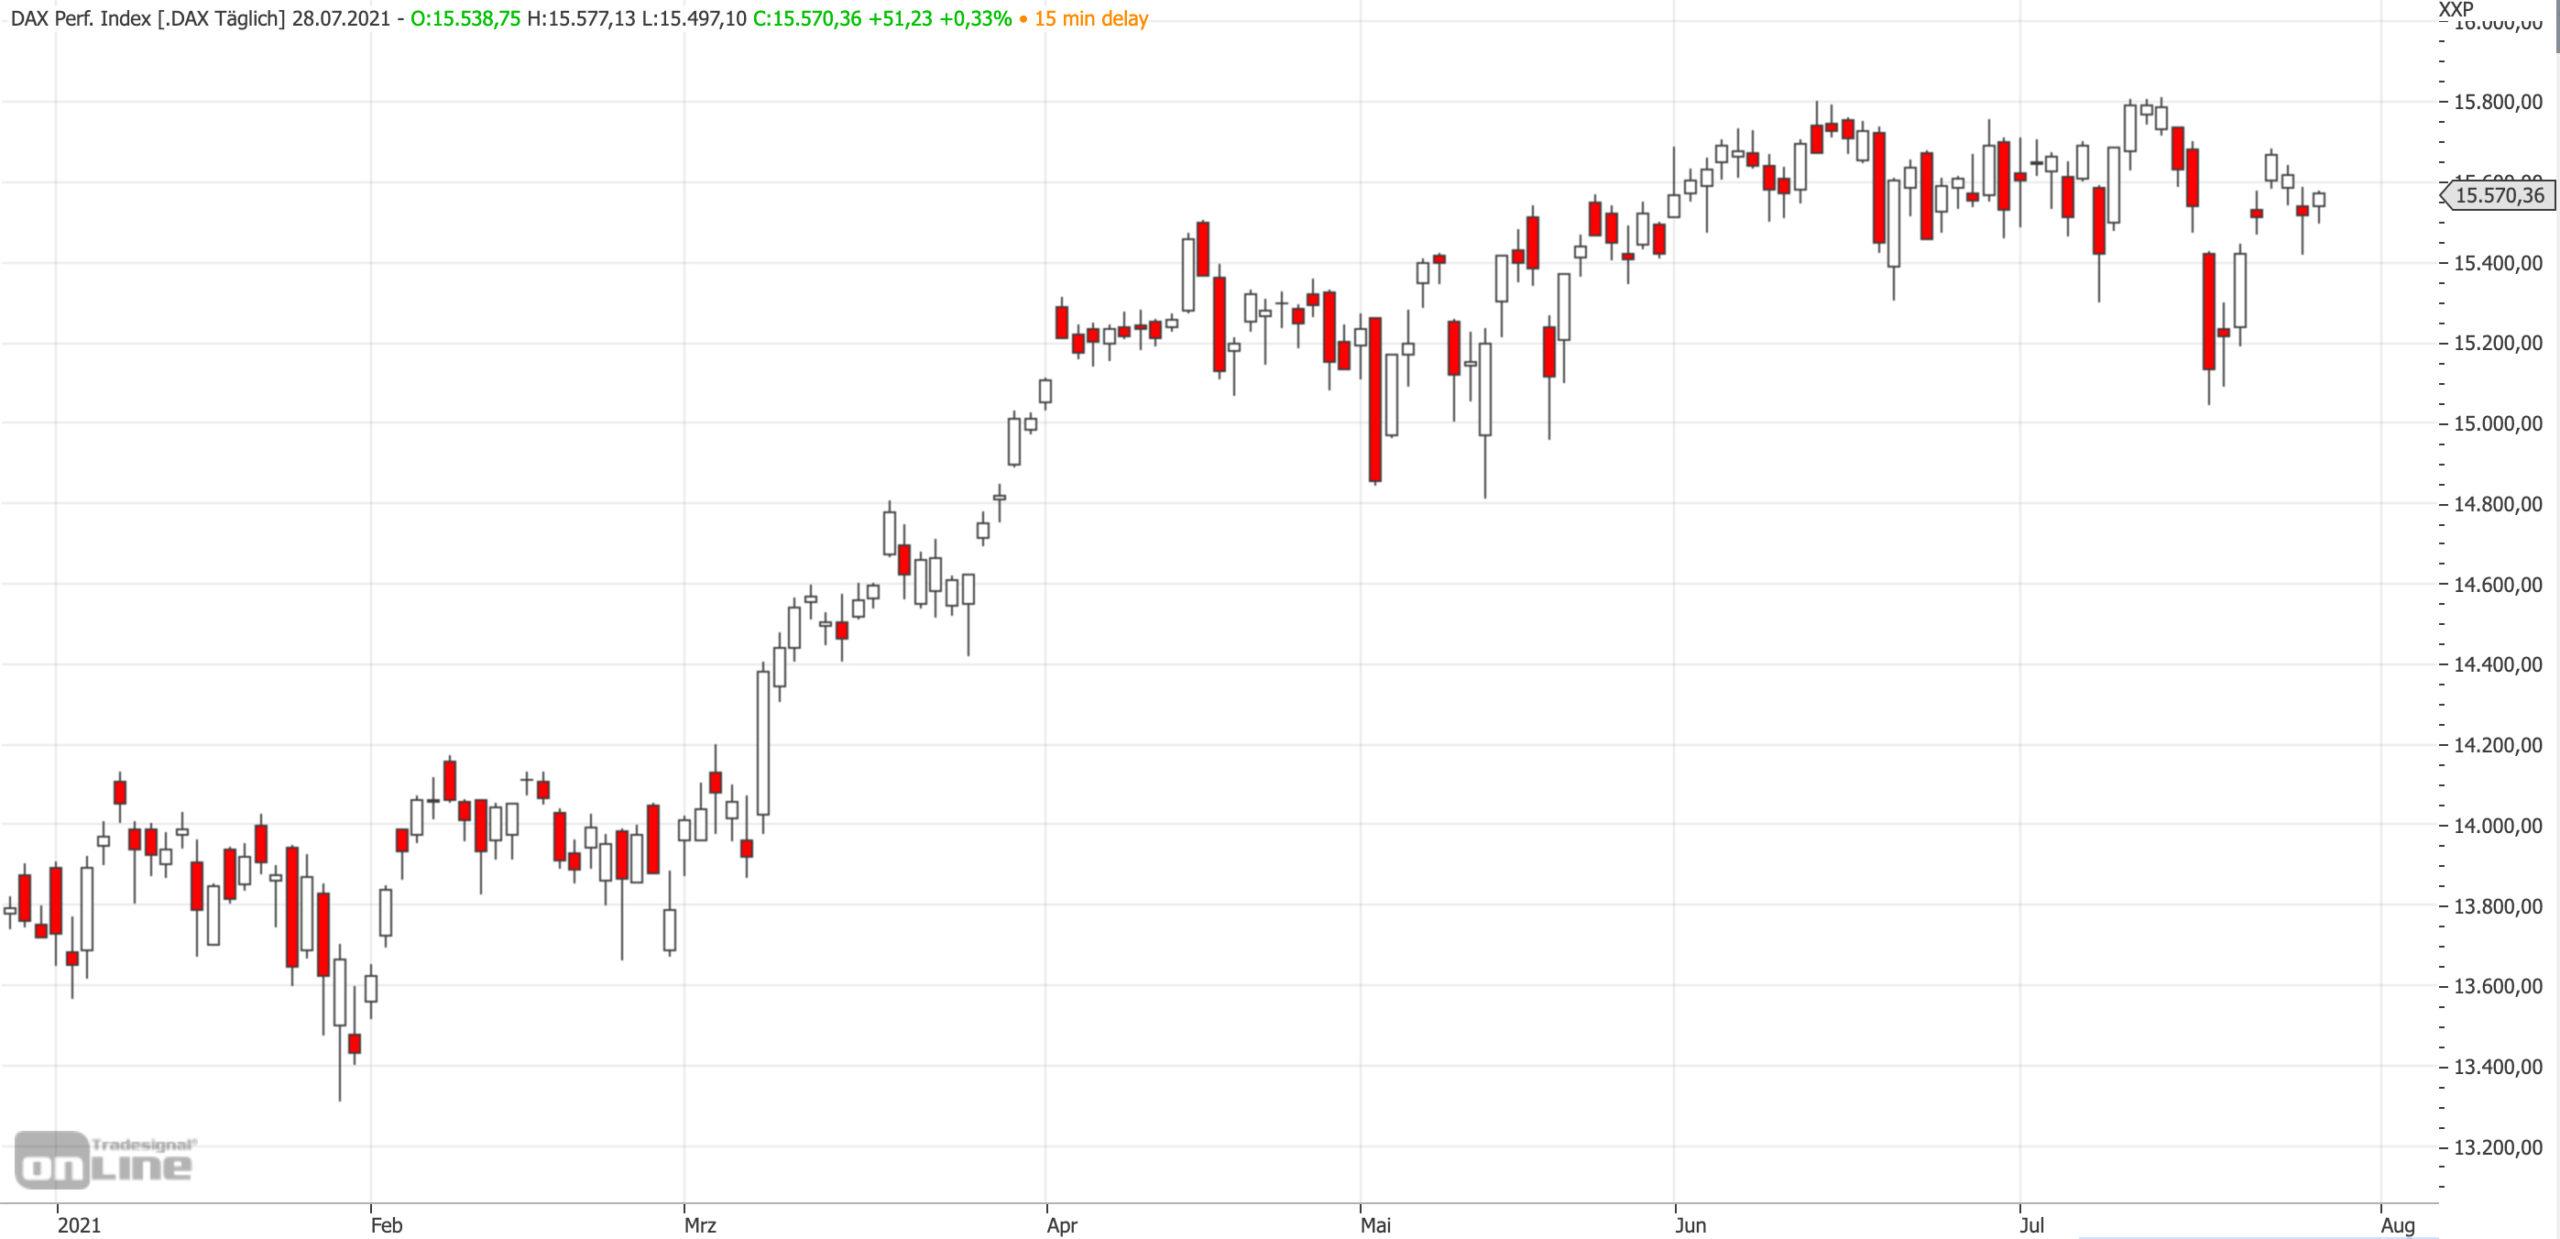 Mittelfristiger DAX-Chart am 28.07.2021